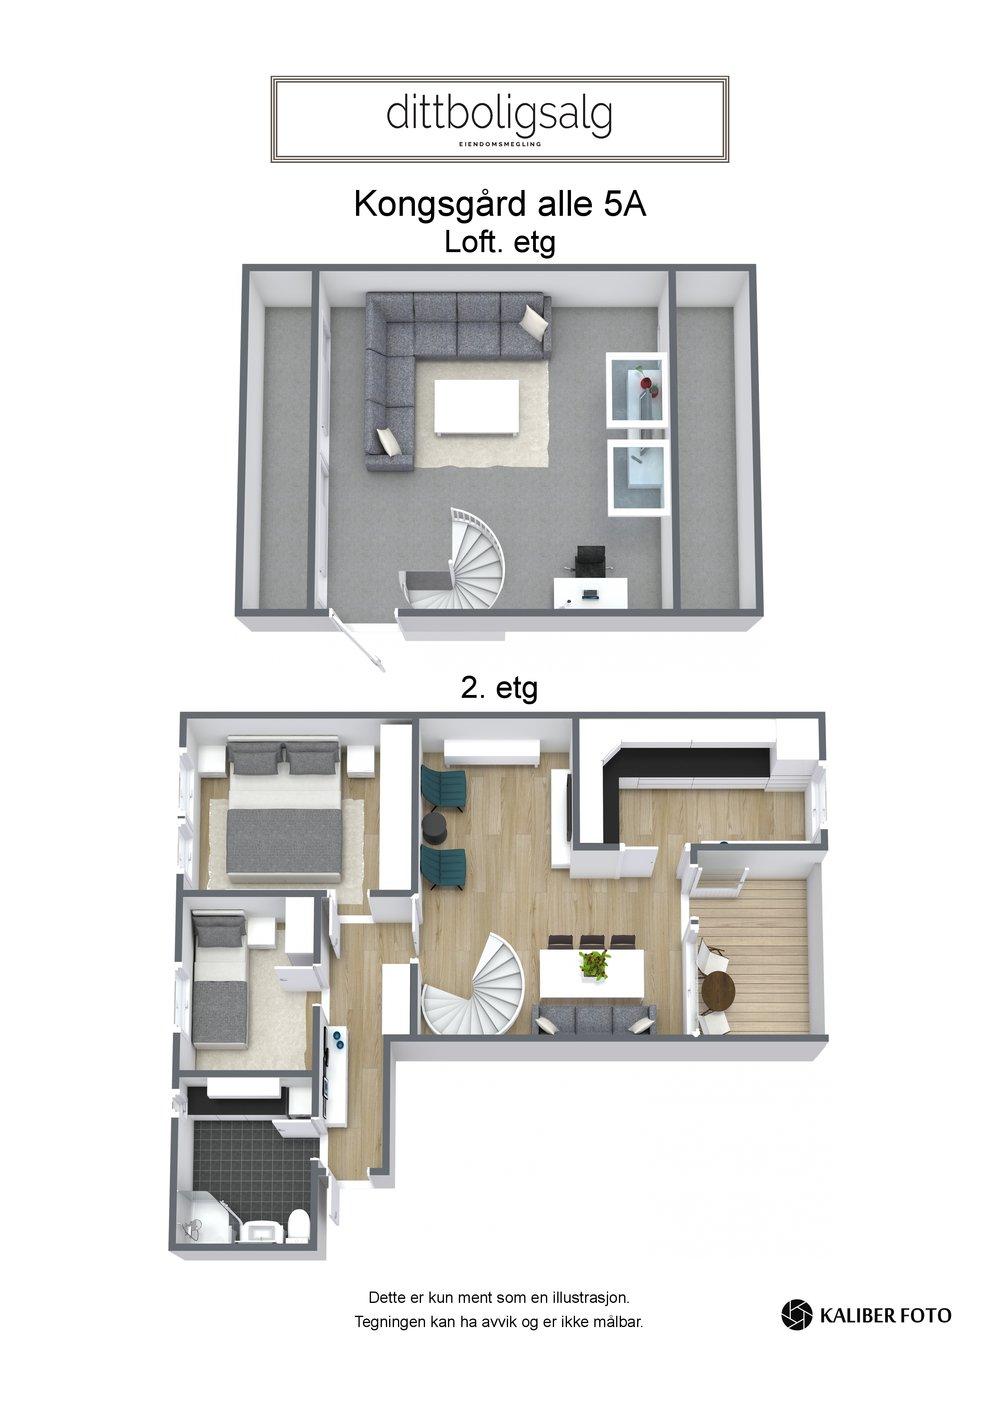 Project letterhead - Kongsgård alle 5A - 3D Floor Plan (1).jpg